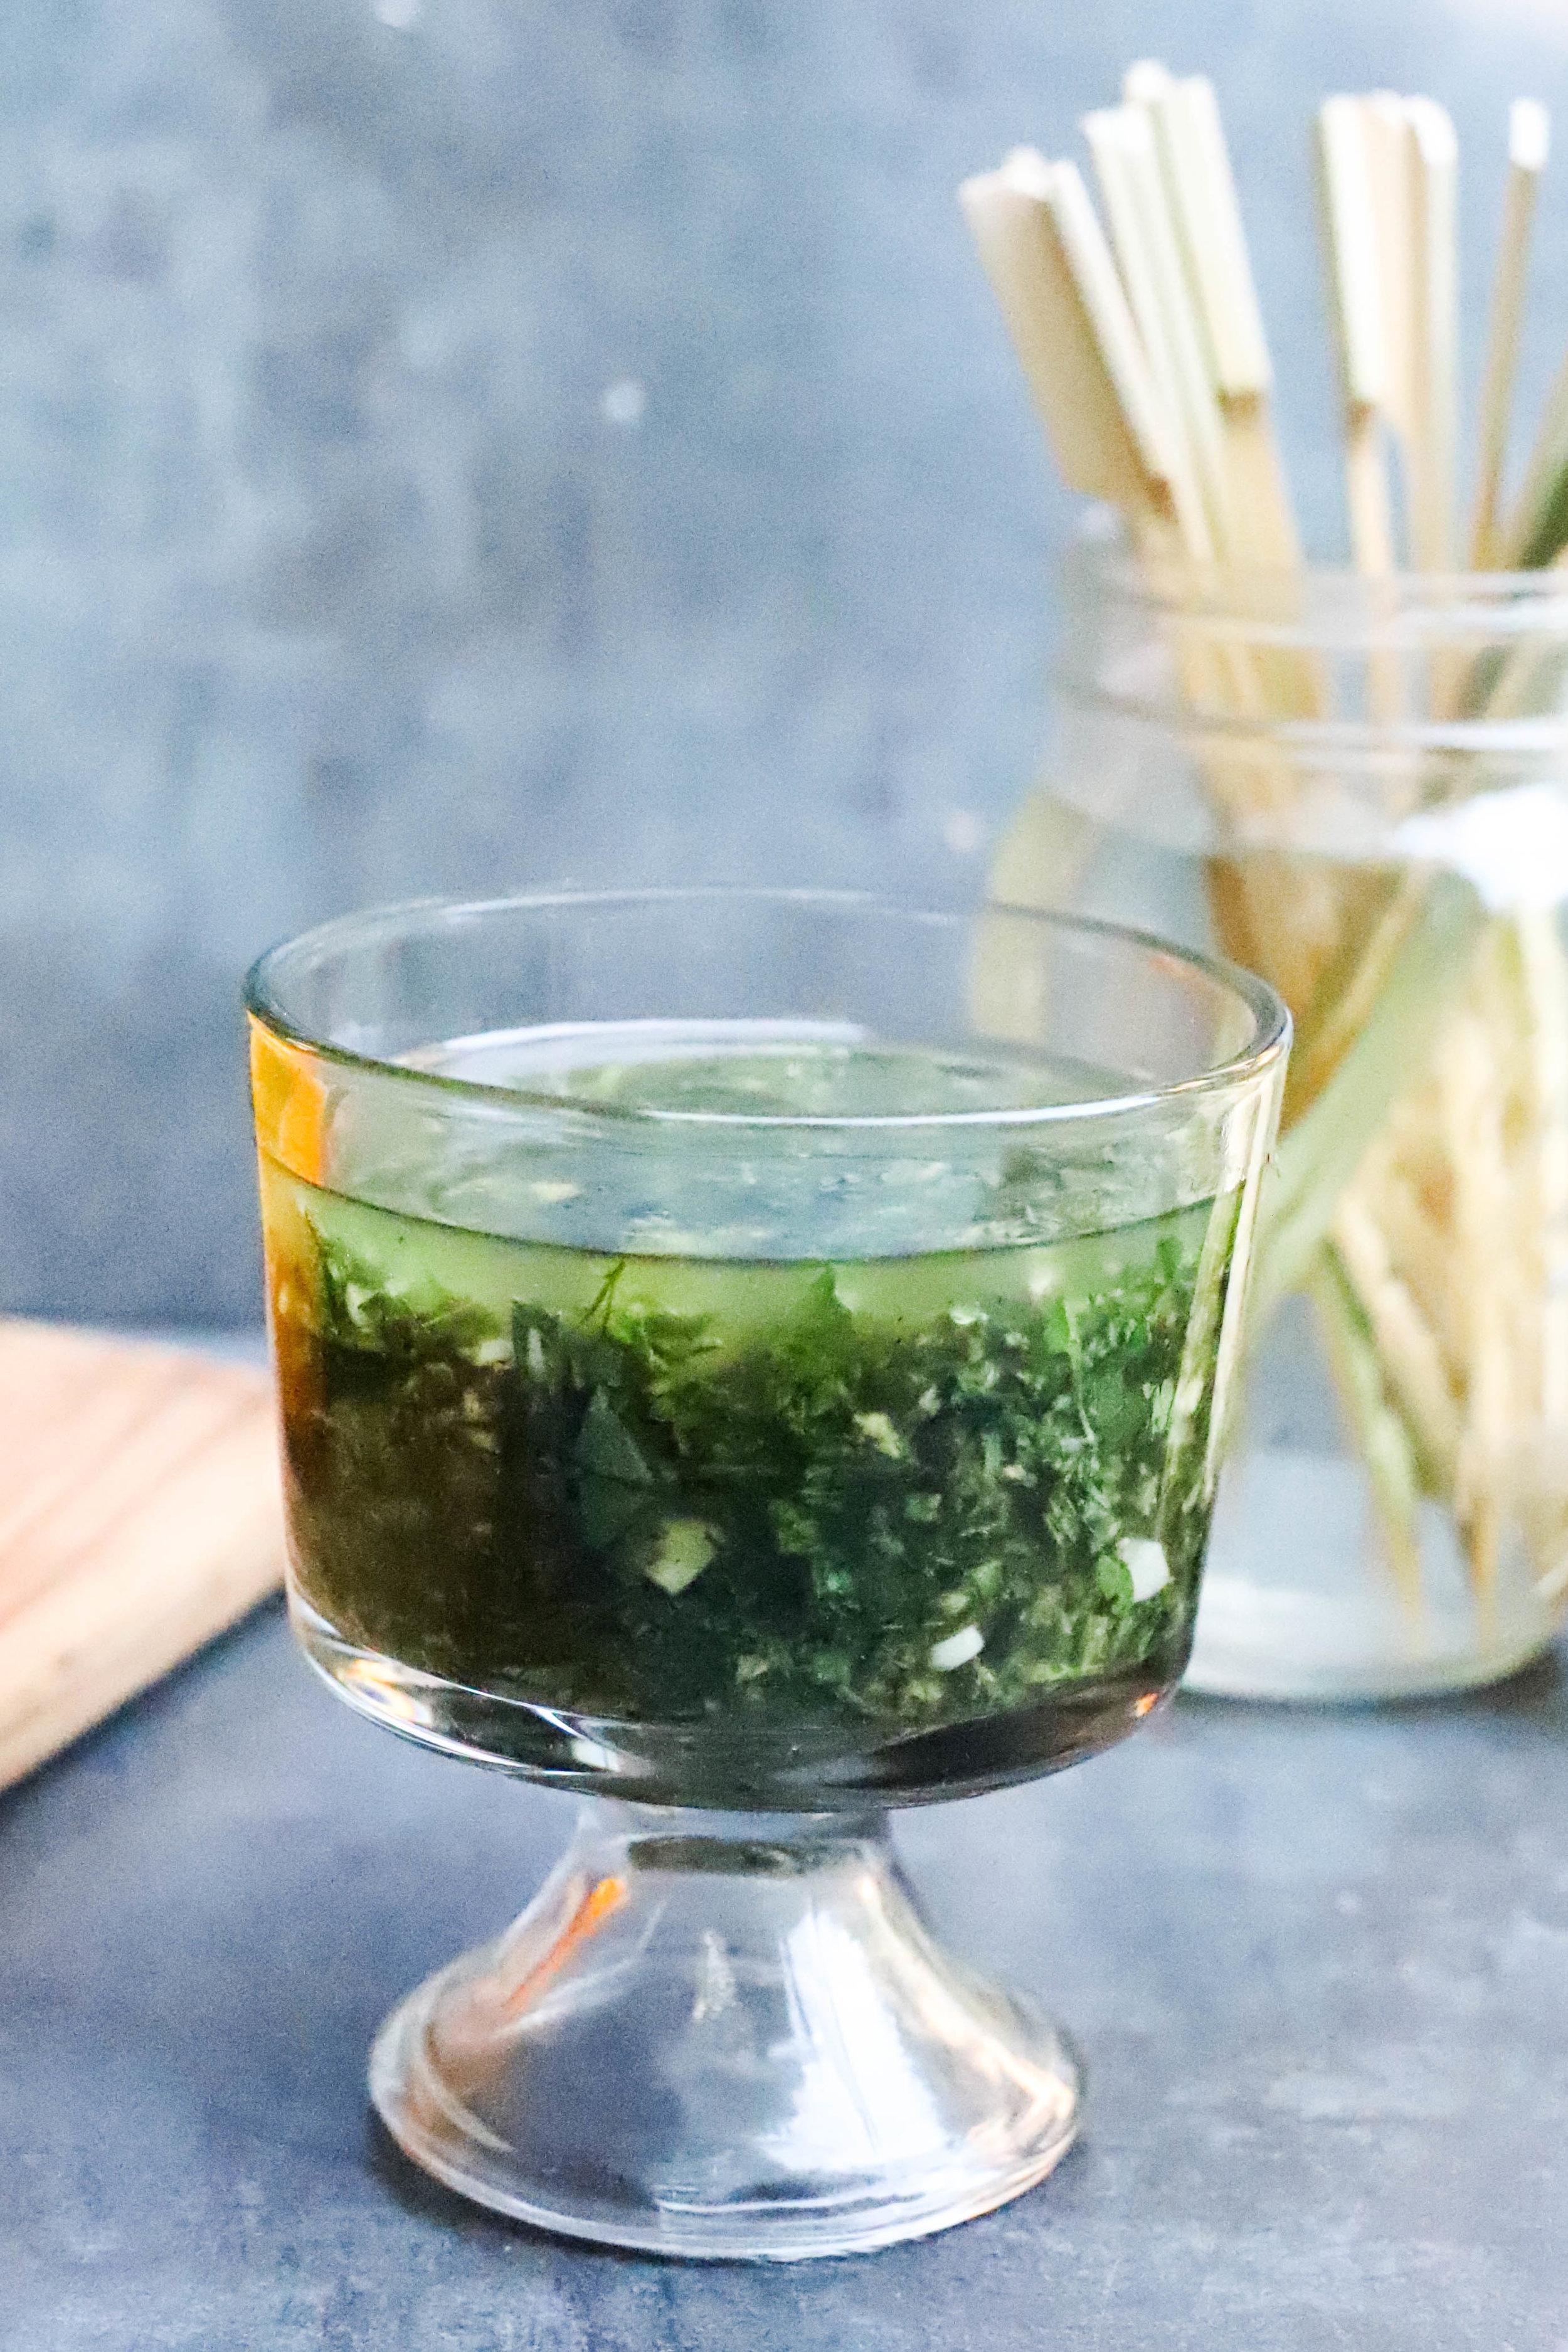 All Purpose Garlic & Herbs Marinade